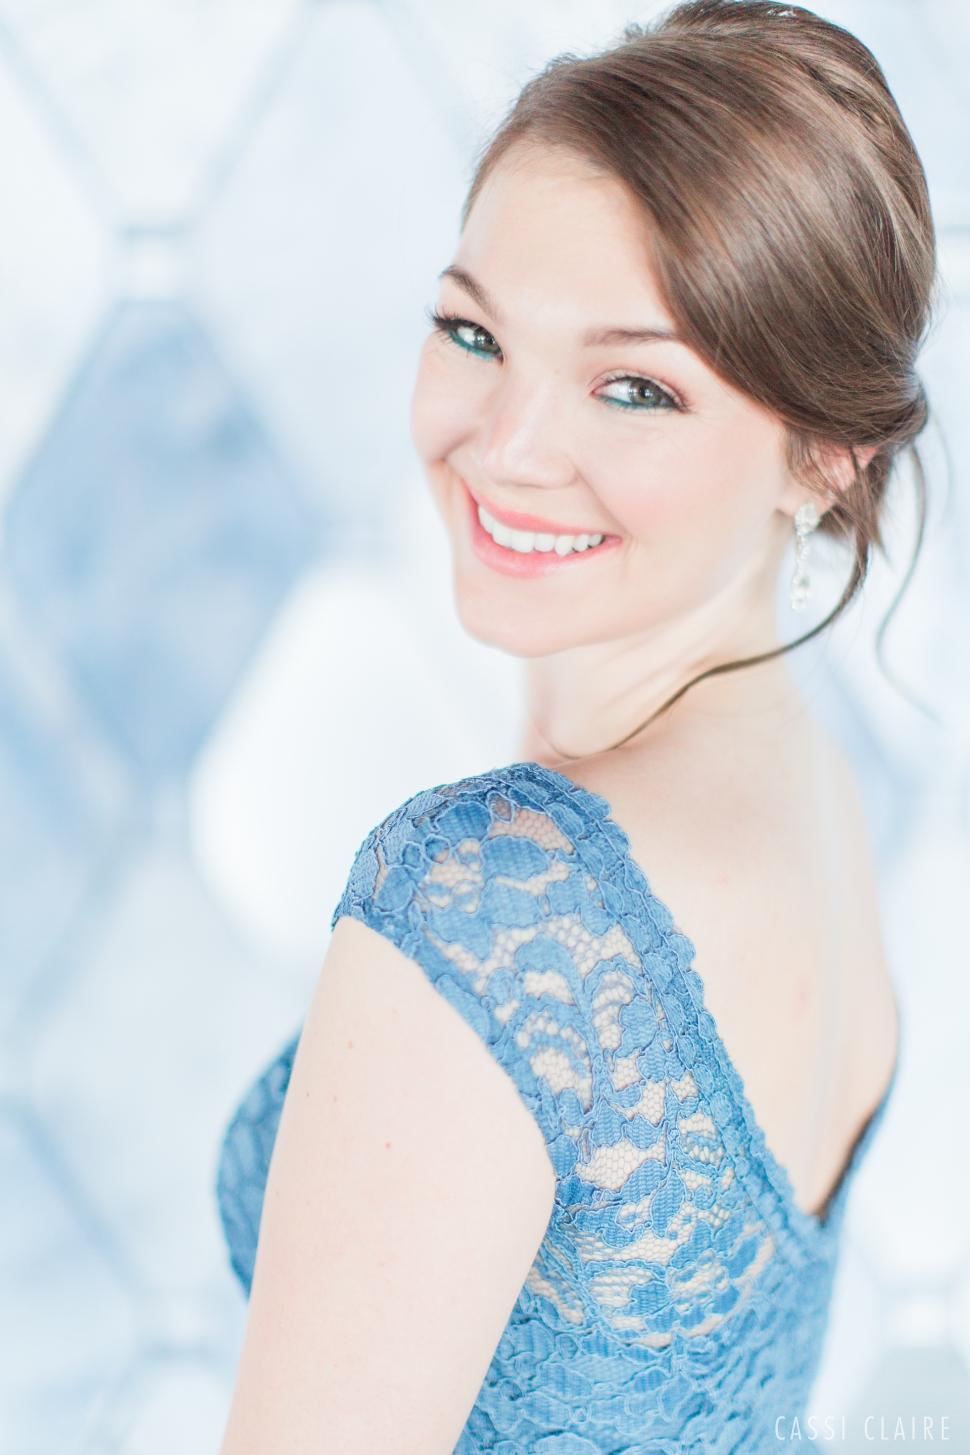 Blue-Monotone-Wedding_CassiClaire_19.jpg